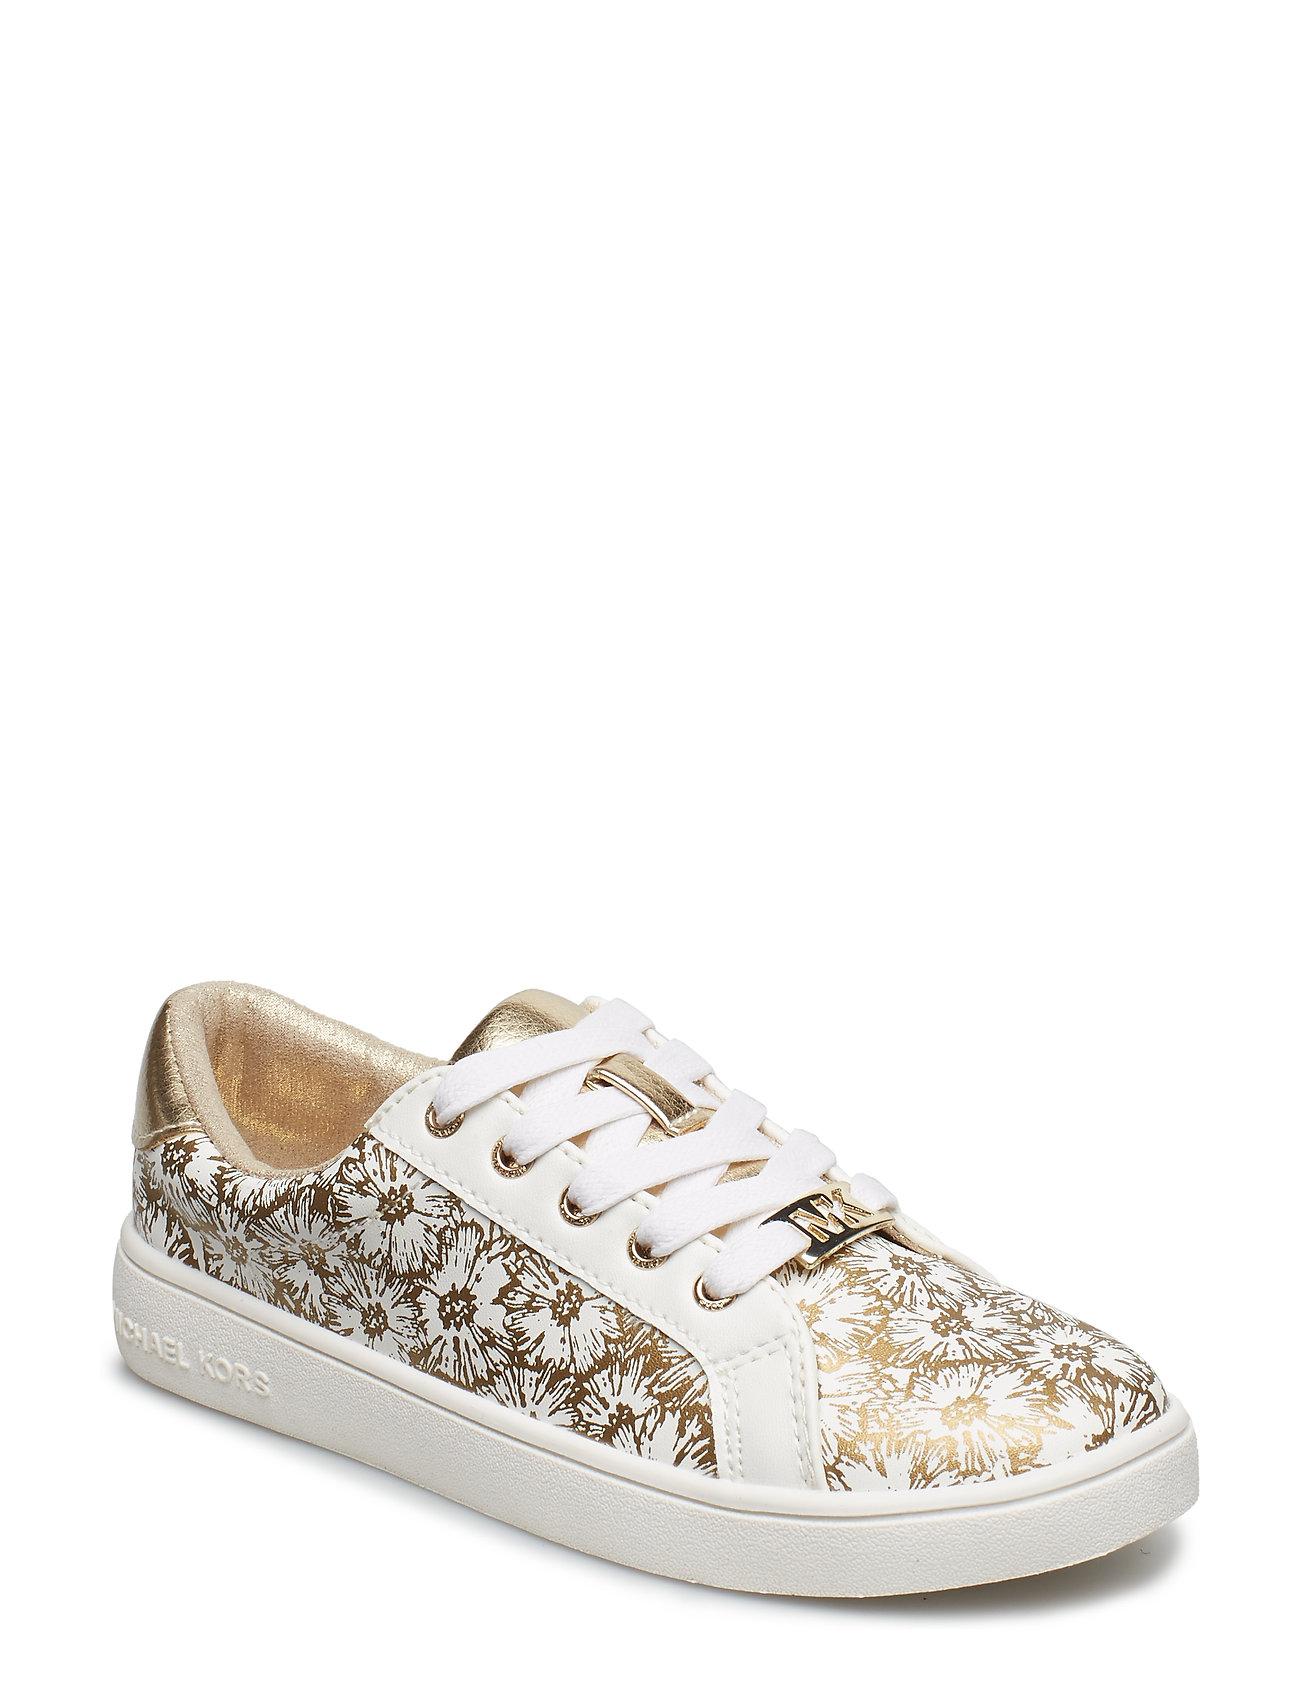 3e9ffbc6 Michael Kors sneakers – Zia Ivy Floral til børn i WHITE GOLD ...